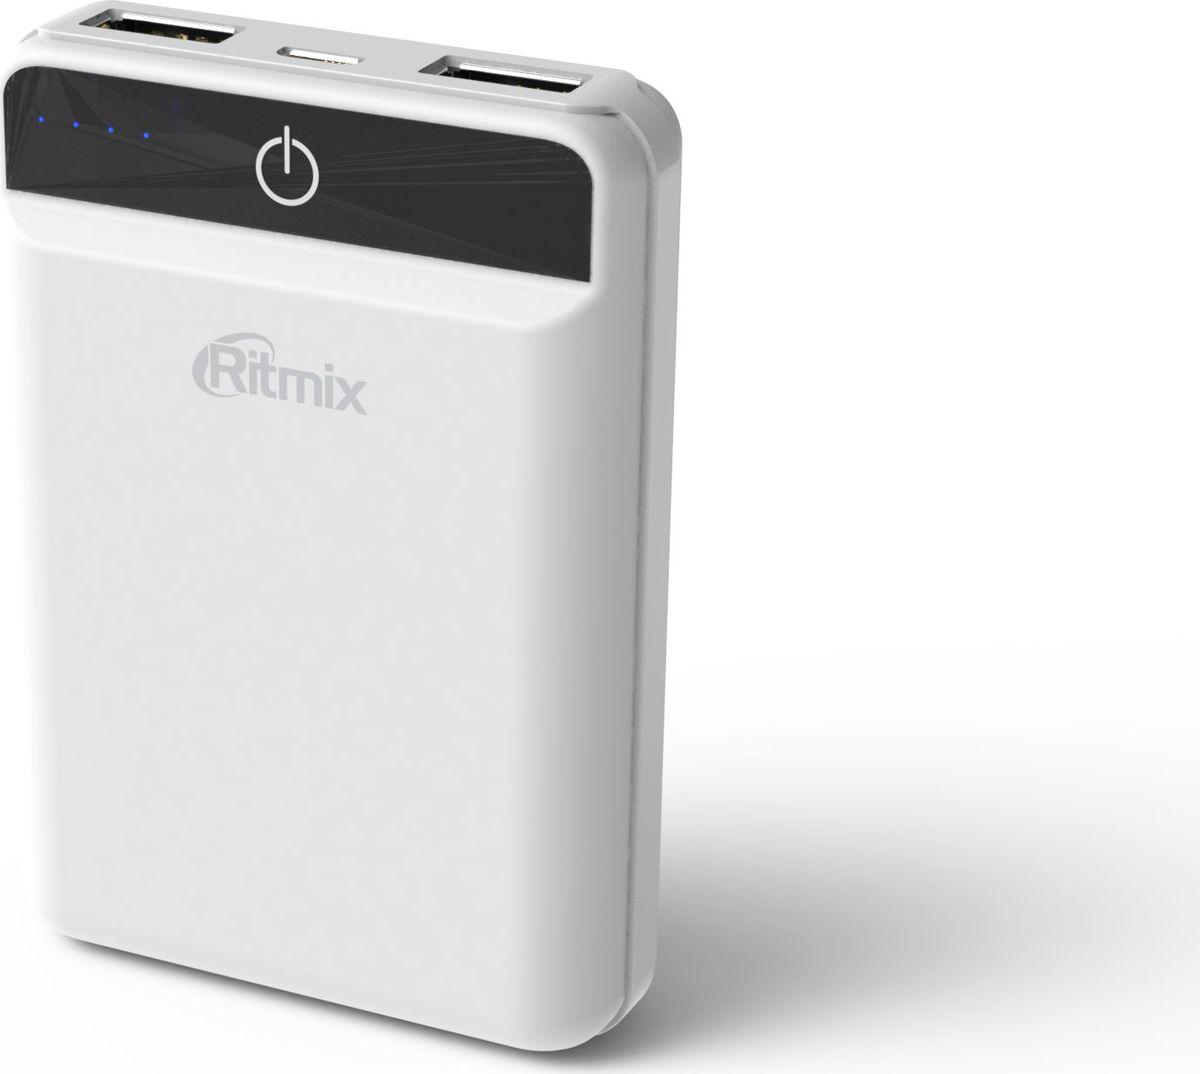 Ritmix RPB-10003L, White внешний аккумулятор (10000 мАч)15119474Power bank Li-Polymer, ёмкость 10 000мАч выход 2xUSB 5В 2,4А max, световой индикатор заряда, размер 92,5*64*23,5, цвет: белый